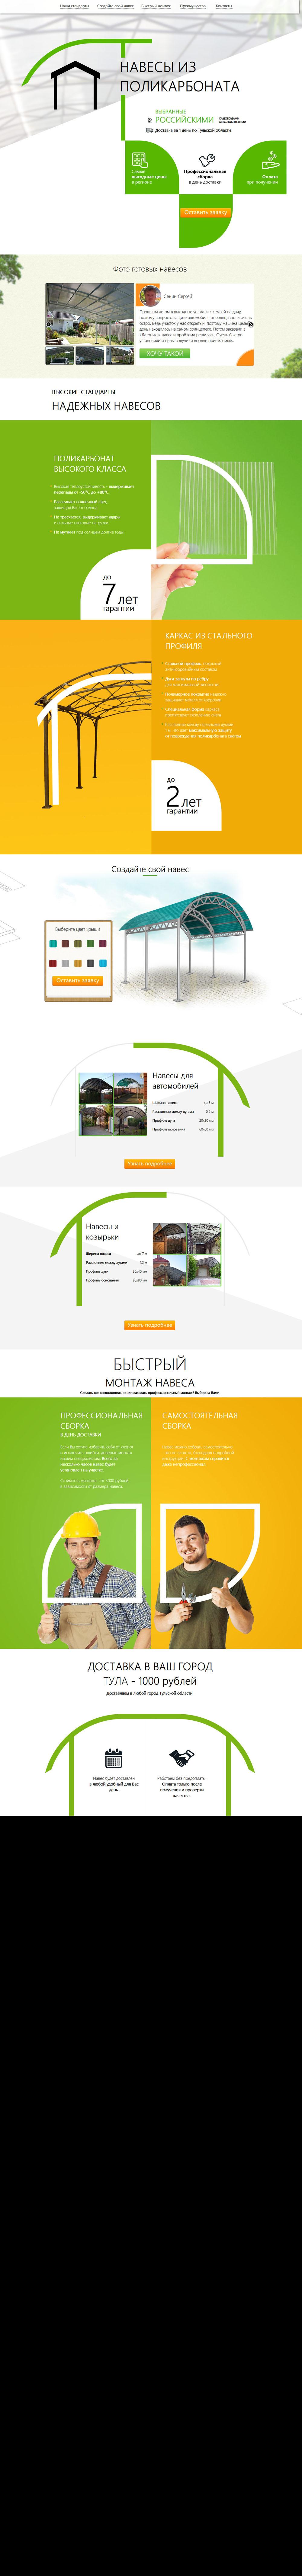 Шаблон лендинга: Навесы из поликарбоната